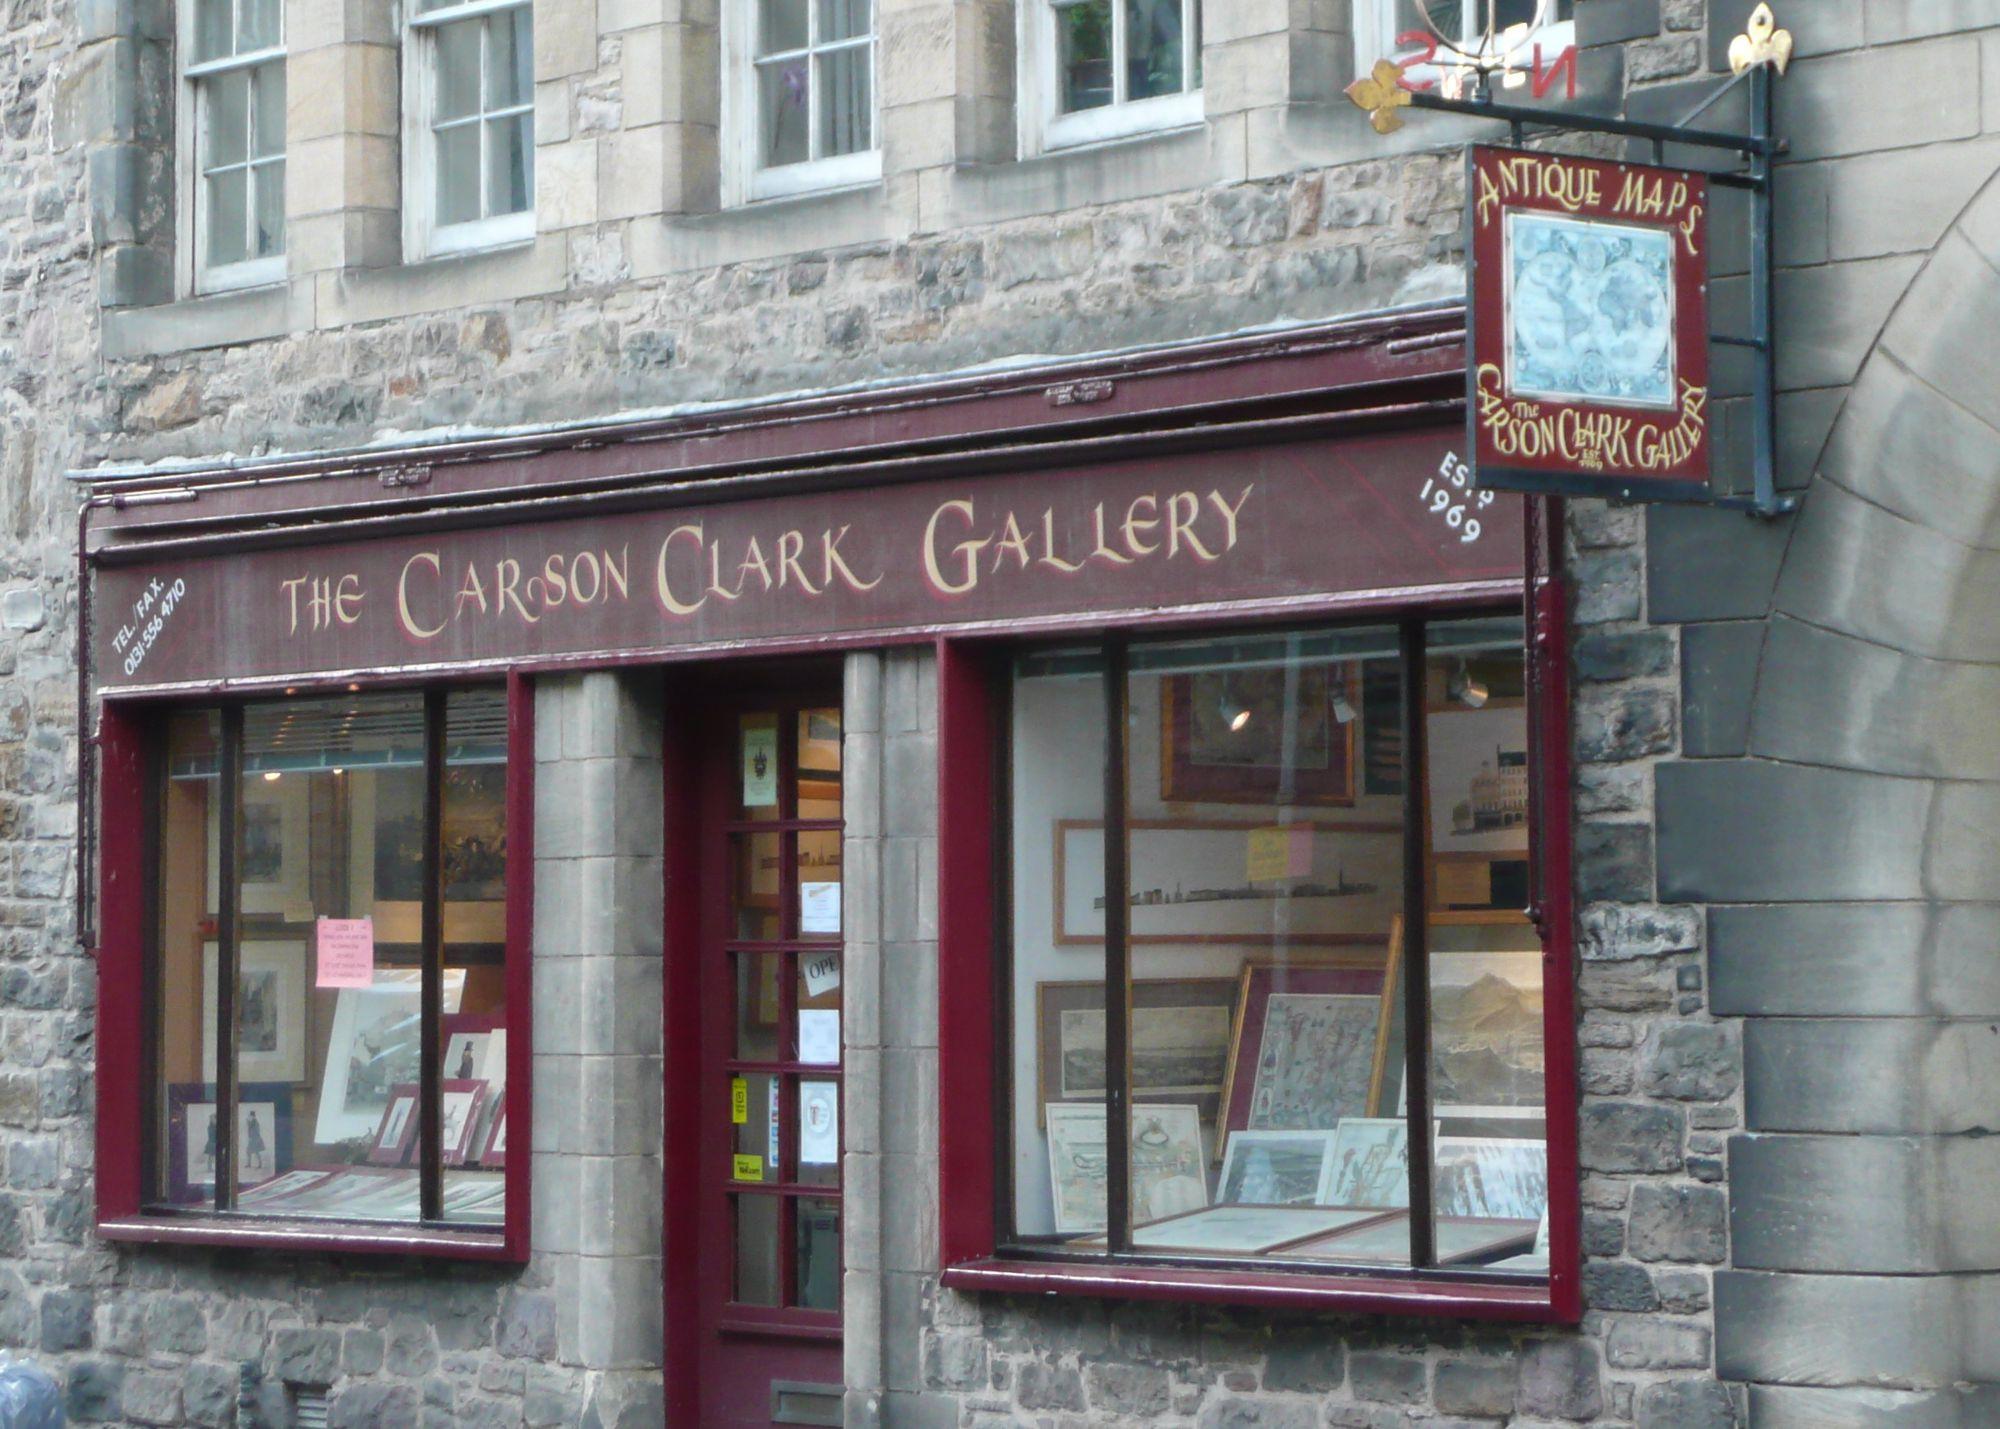 The Carson Clark Gallery